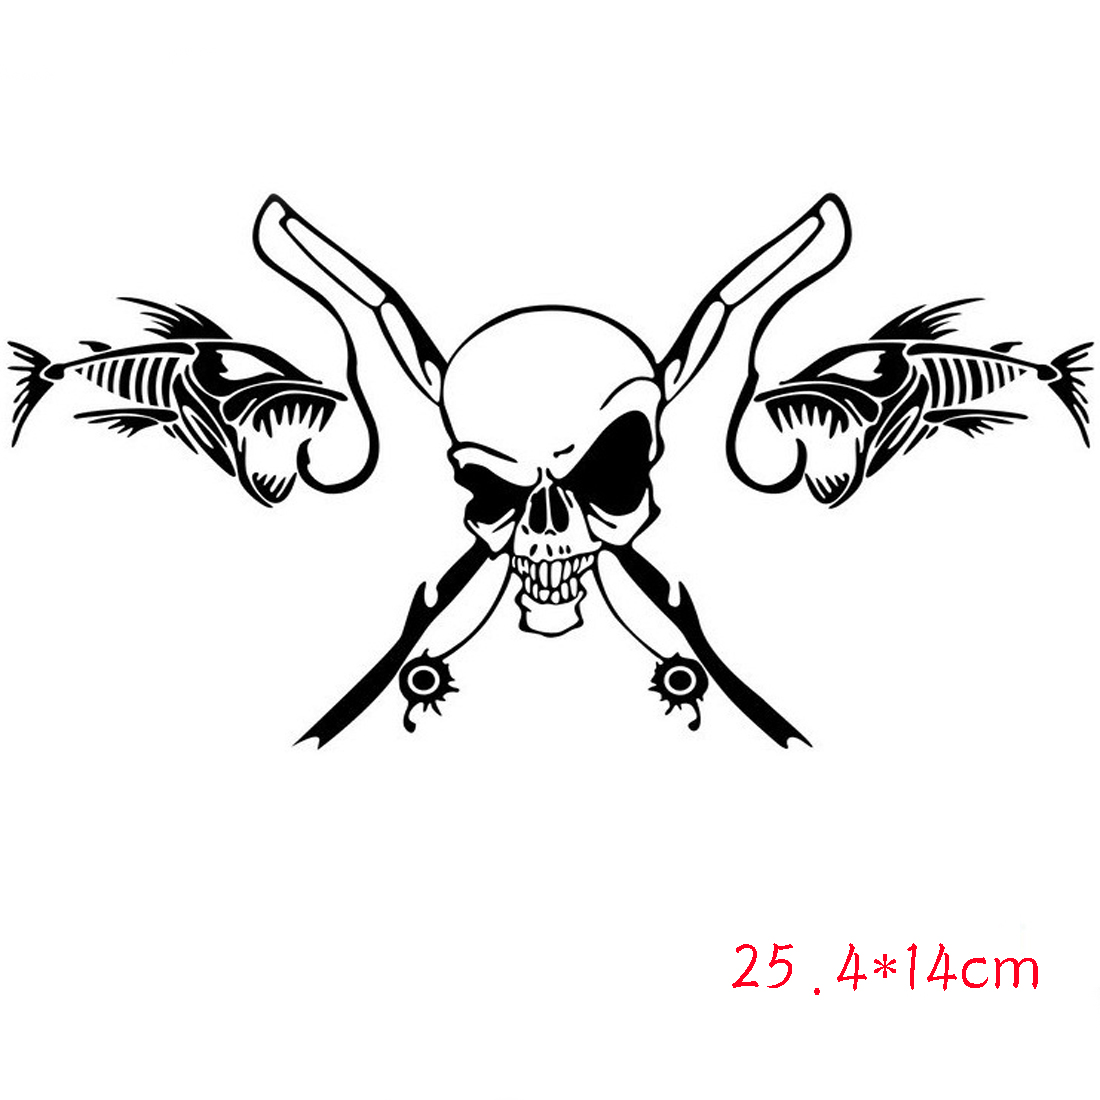 Dewtreetali Hot sale Fishing Skull Skeleton Fish Rod Reel Car Sticker Classic Funny Body Decoration